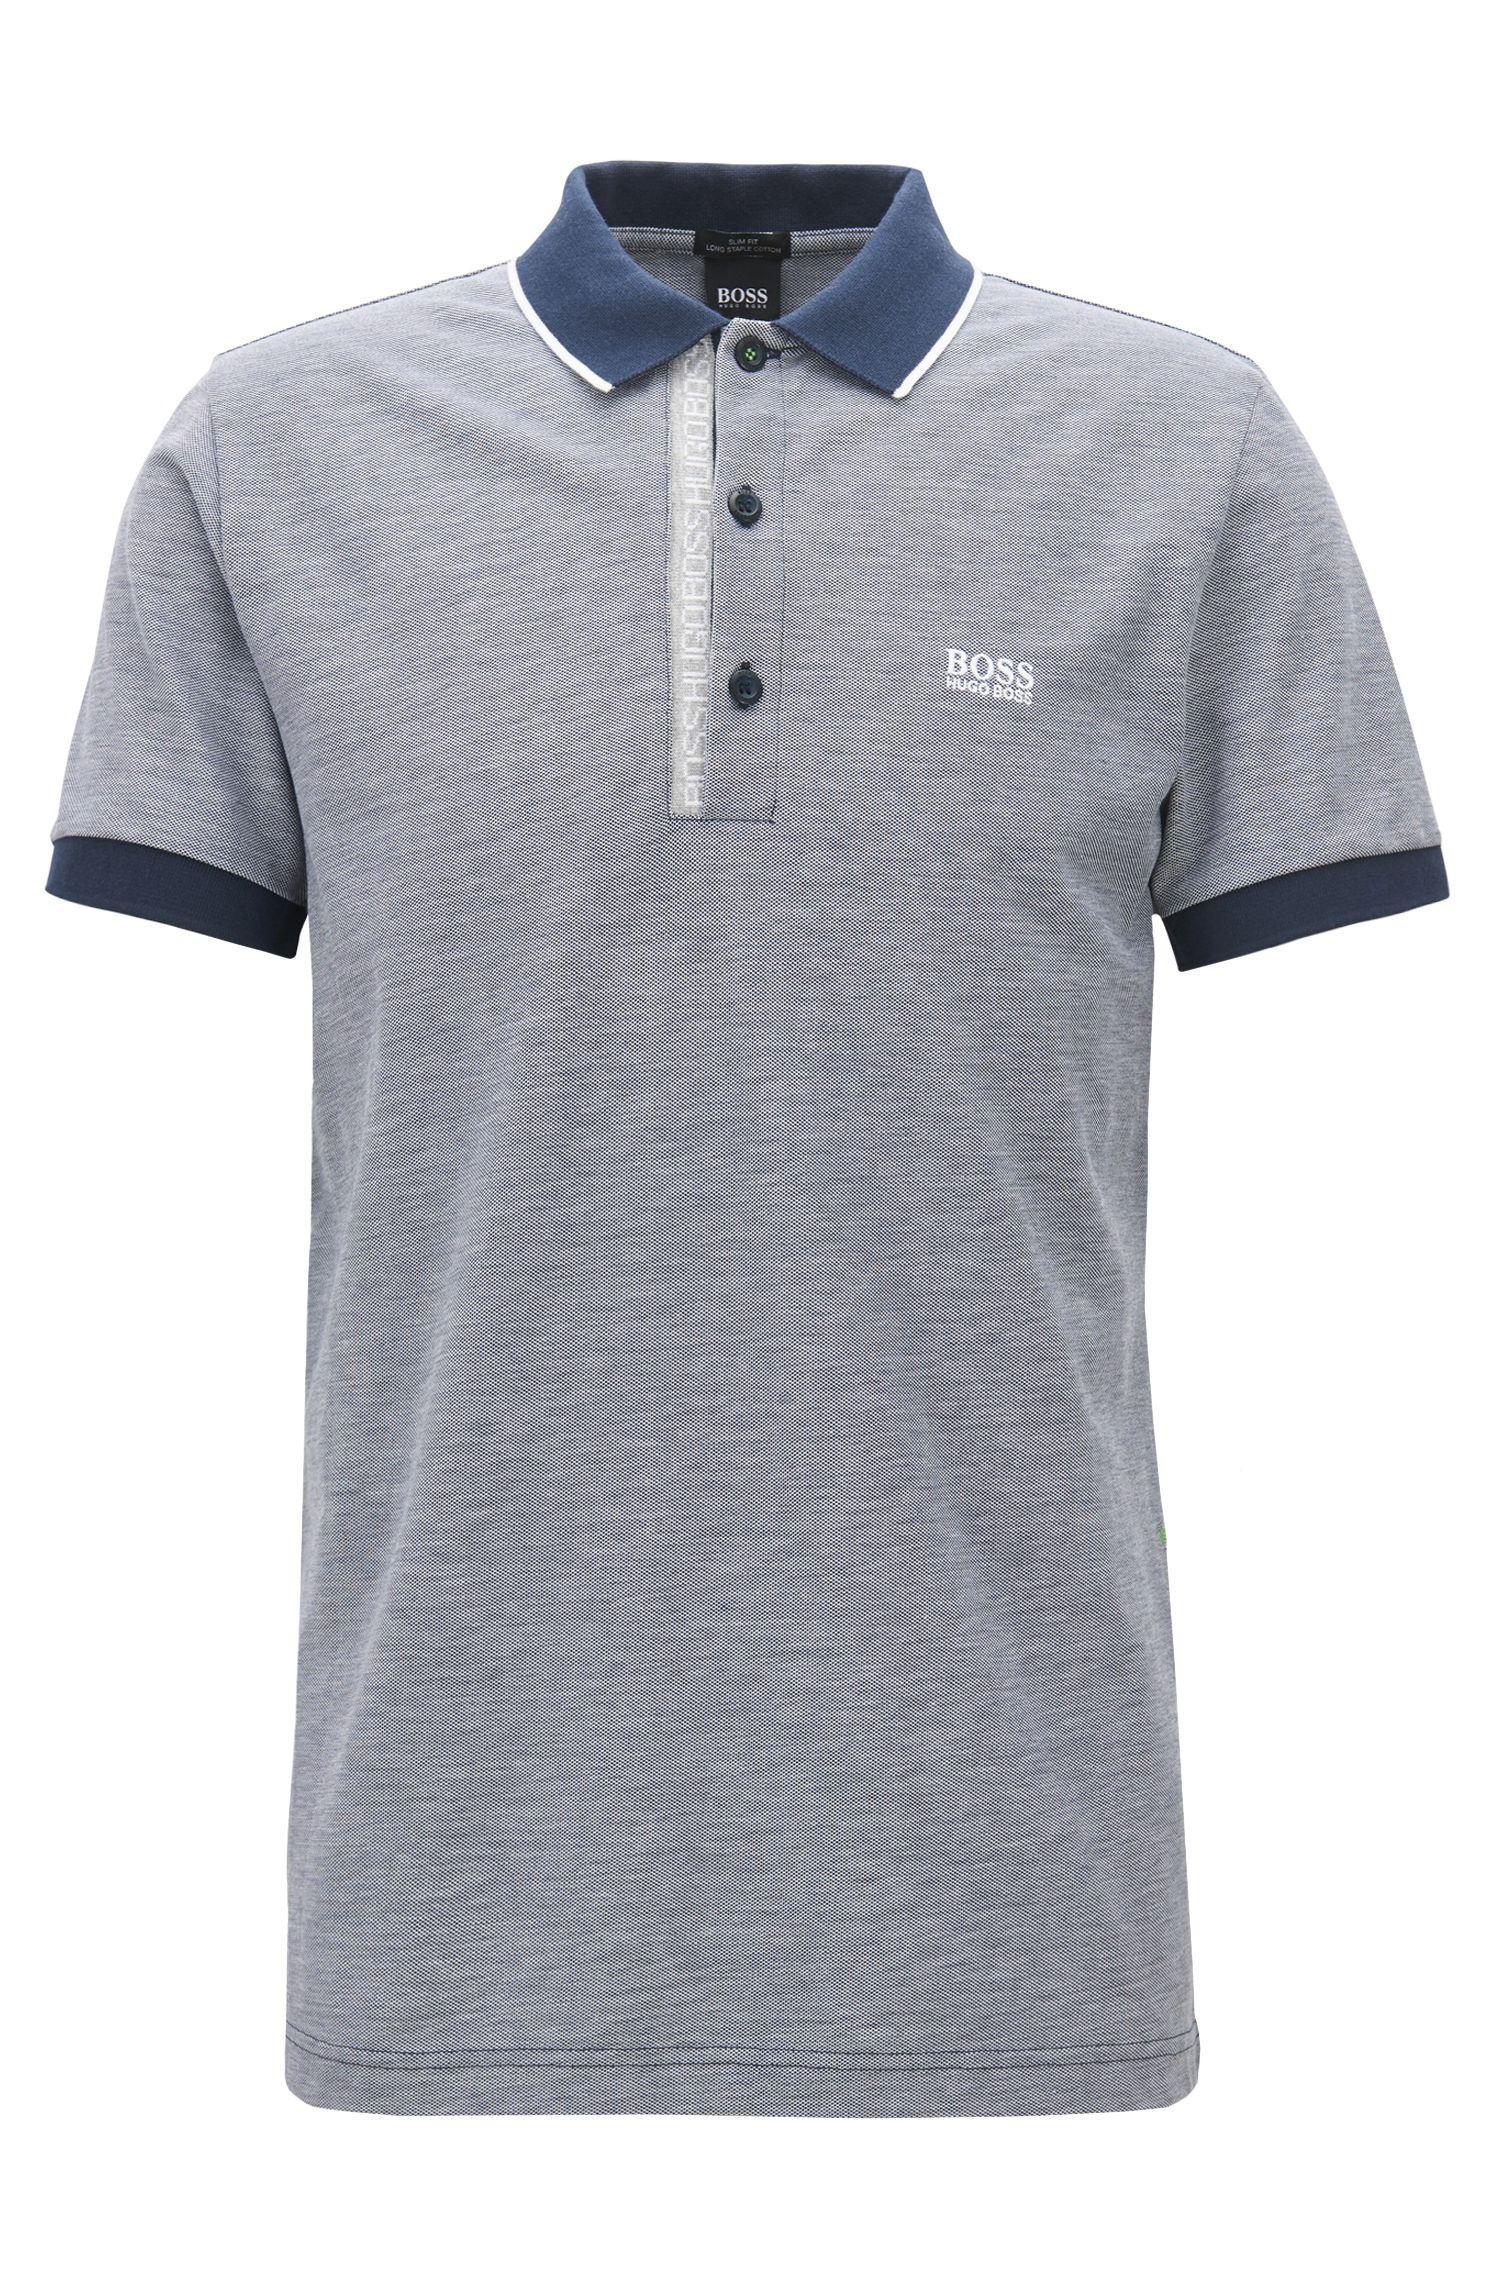 Slim-fit logo polo shirt in cotton piqué, Dark Blue